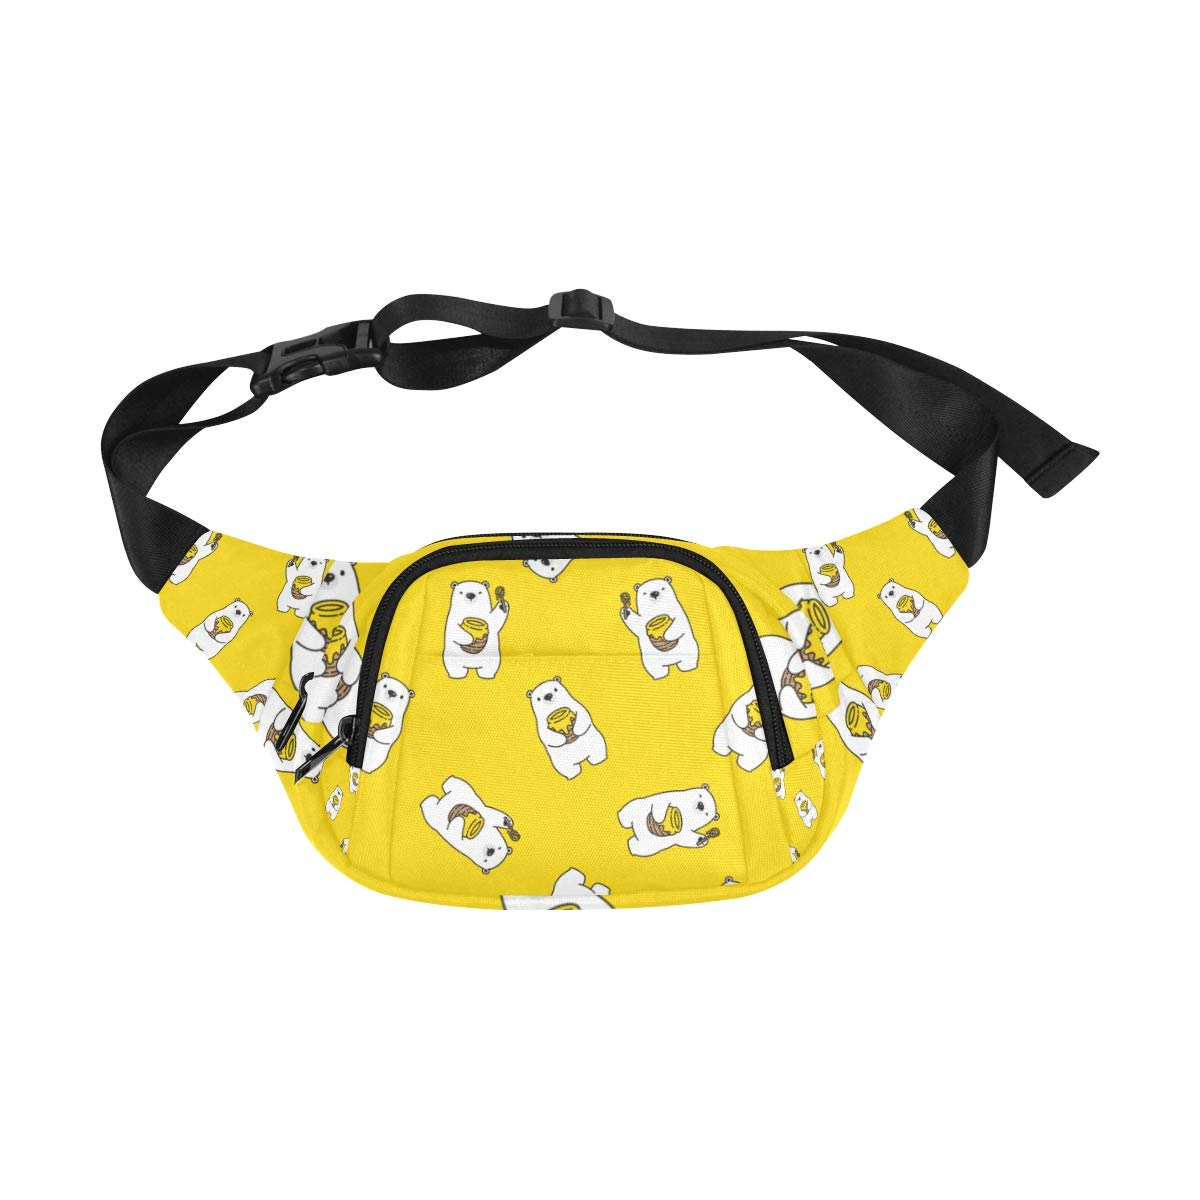 Cute Bear Eating Sweet Honey Fenny Packs Waist Bags Adjustable Belt Waterproof Nylon Travel Running Sport Vacation Party For Men Women Boys Girls Kids